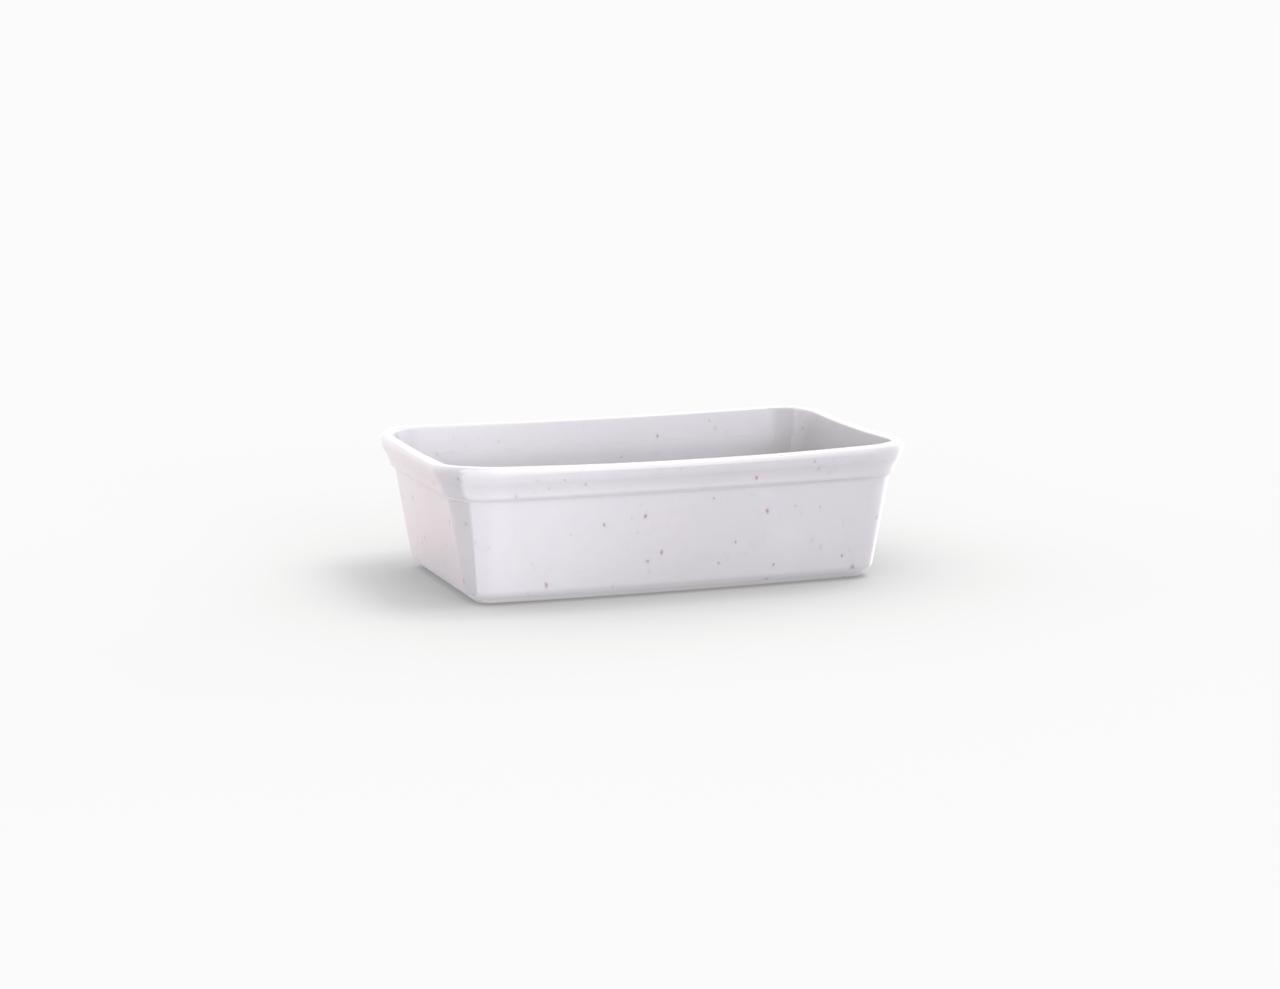 Terrine blanche tachetée 250 cm3